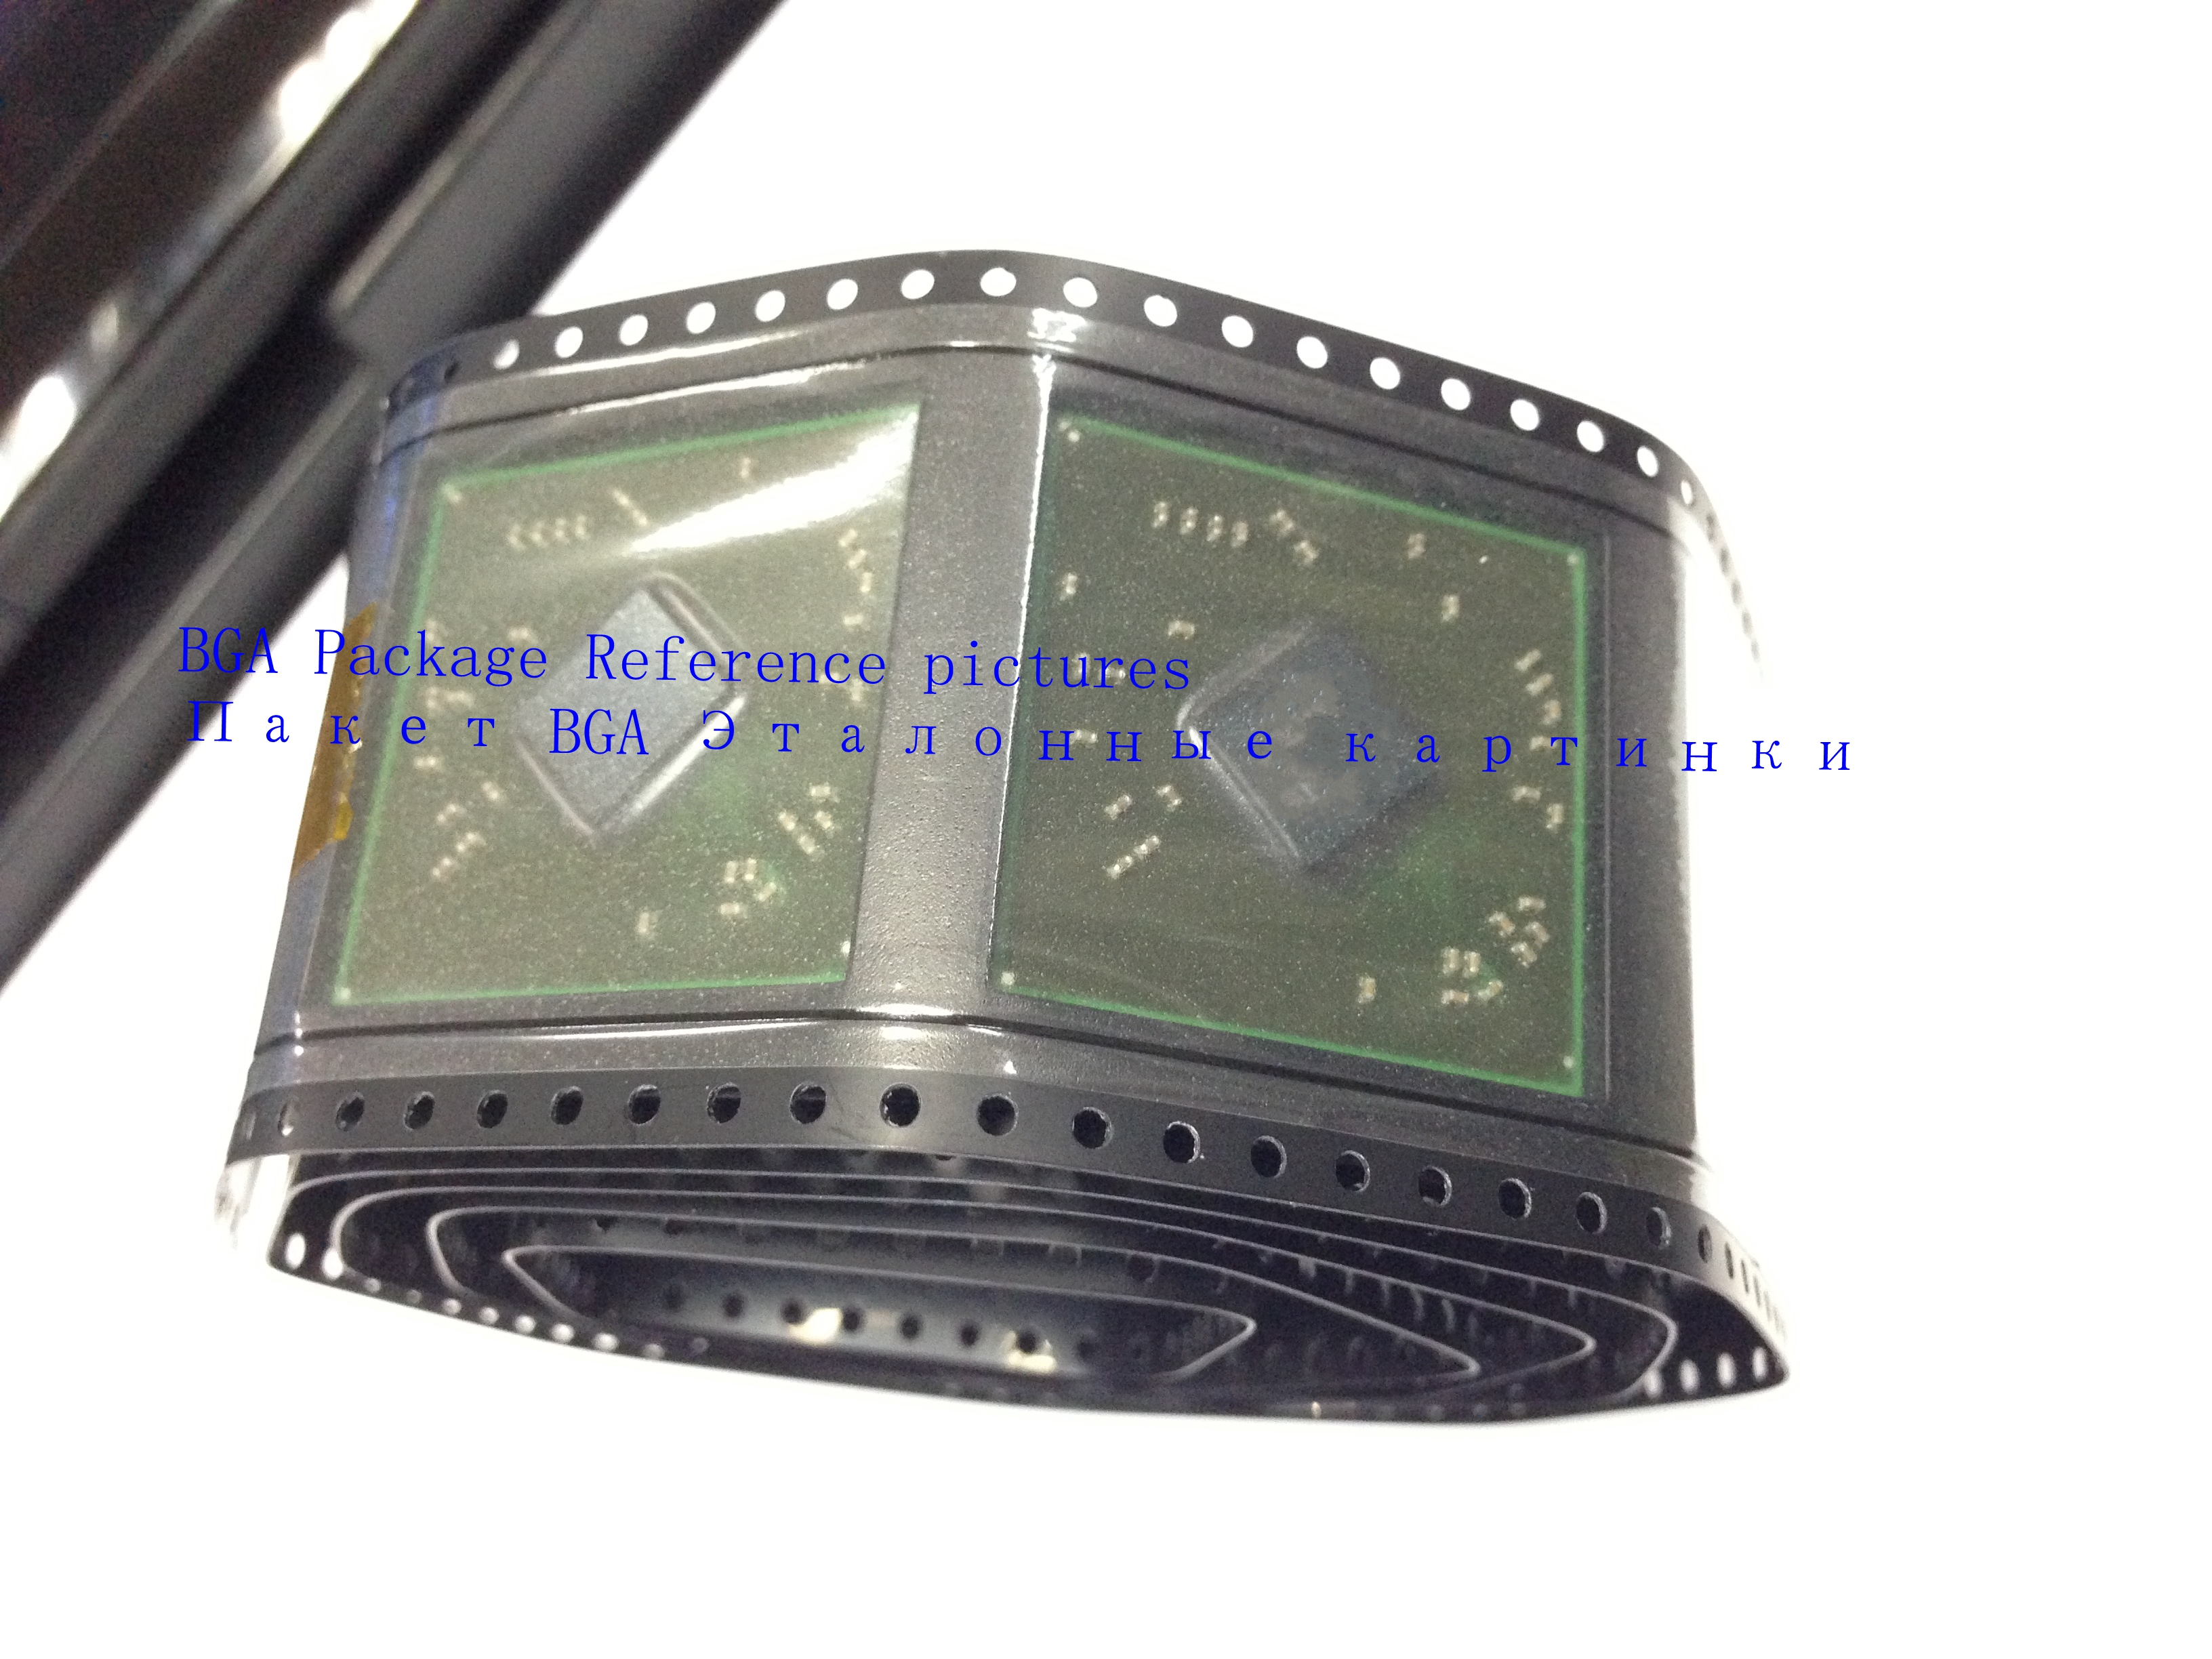 1pcs/lot 100% New BD82QS77 SLJ8B BGA Chipset1pcs/lot 100% New BD82QS77 SLJ8B BGA Chipset